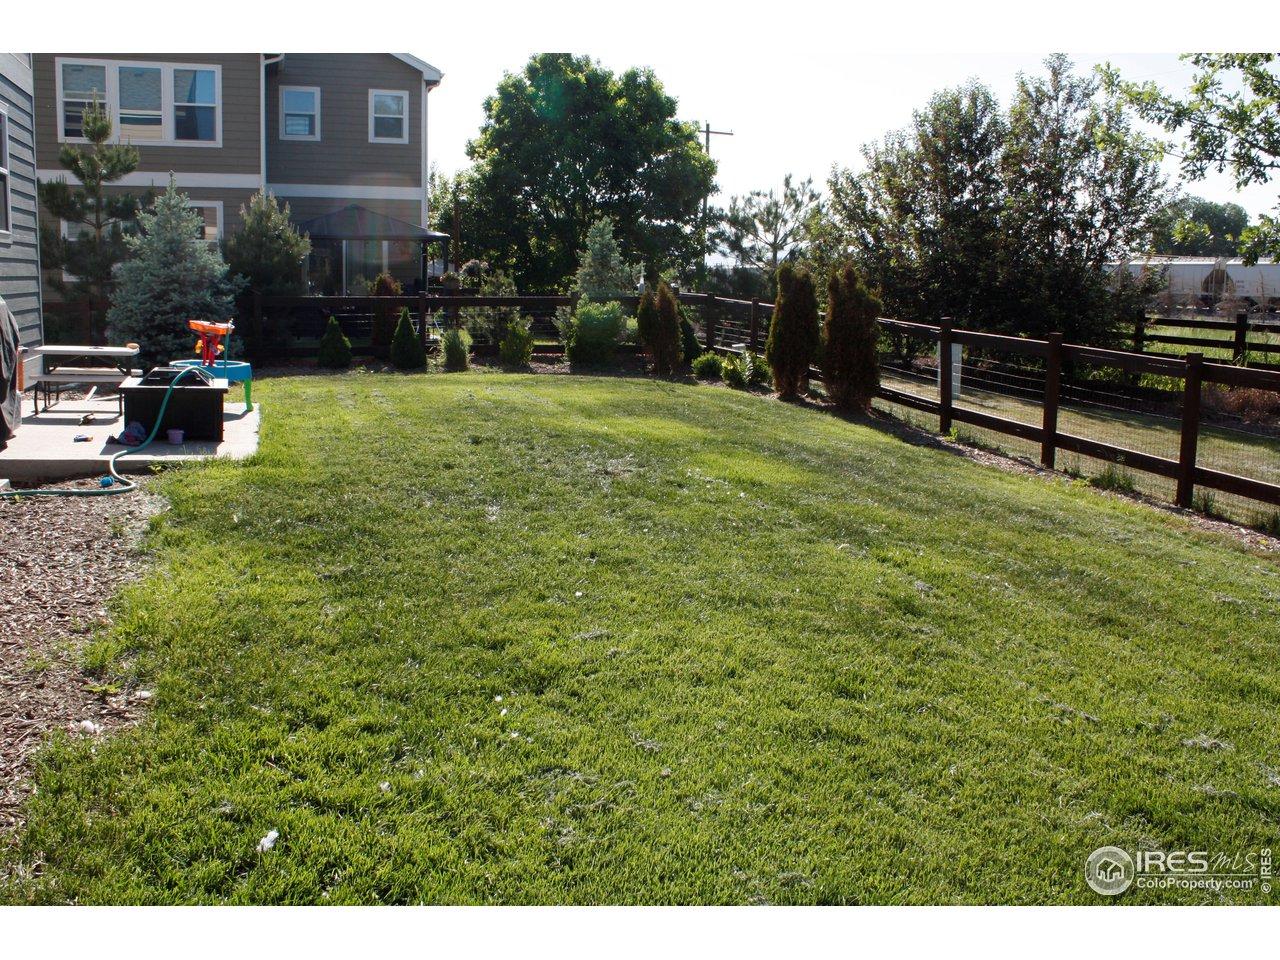 back yard side view